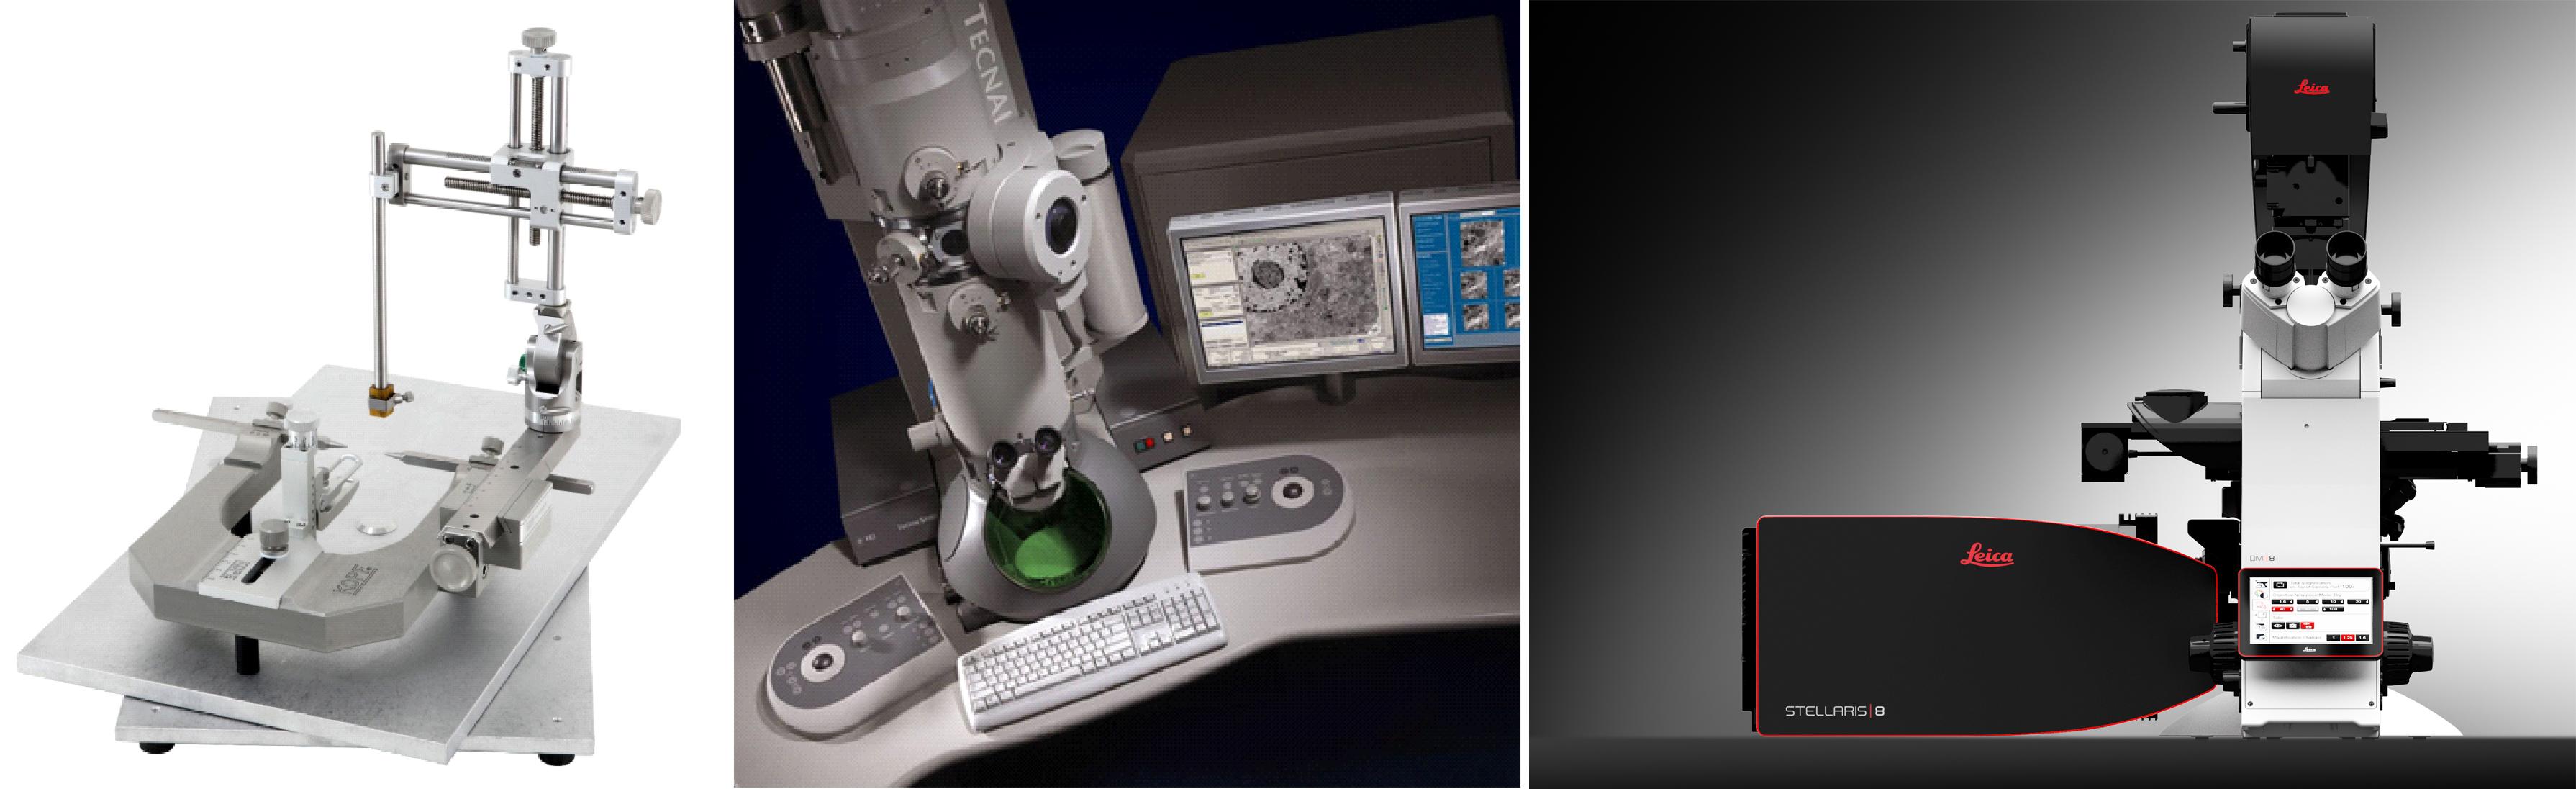 Análisis imágenes microscopia